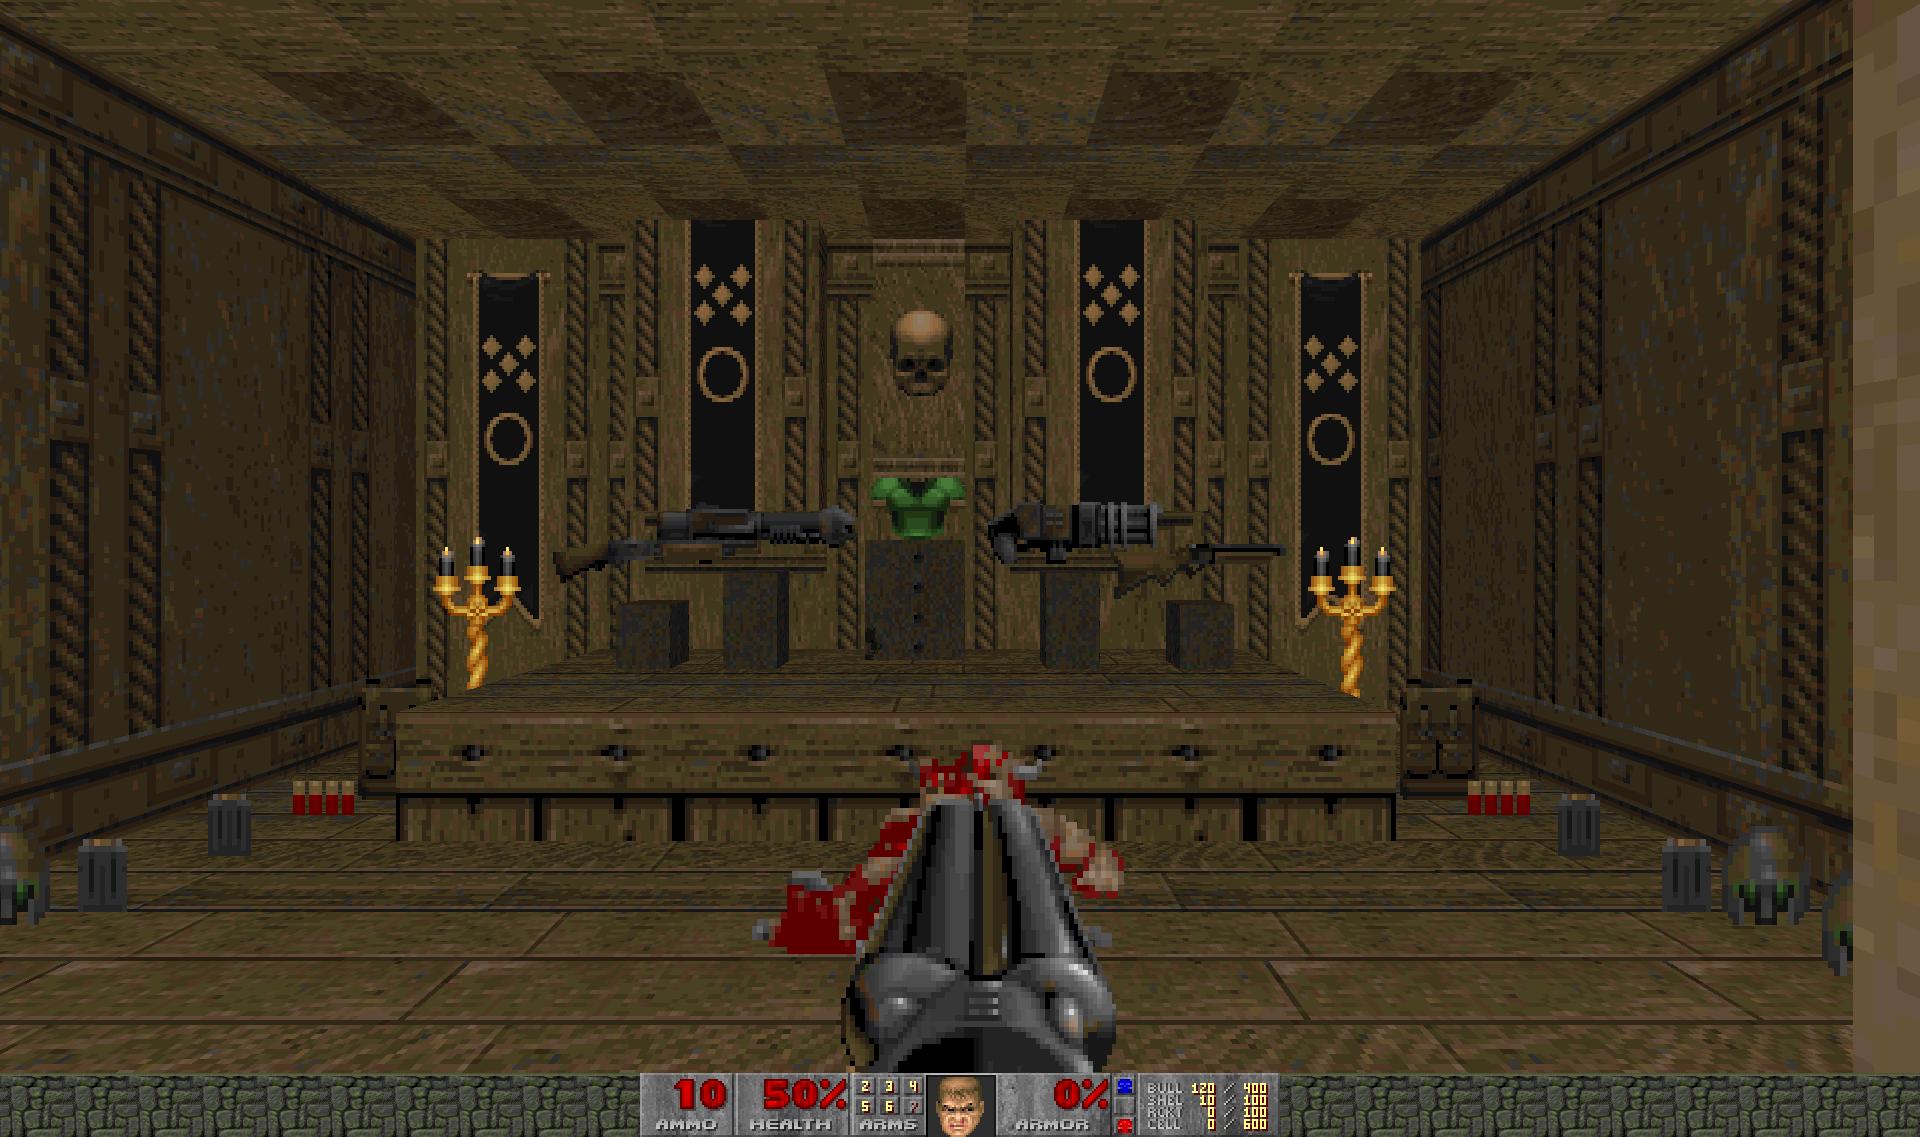 Screenshot_Doom_20210325_130532.png.adf226e5e1f0bff5bca3e6e8693e5c23.png